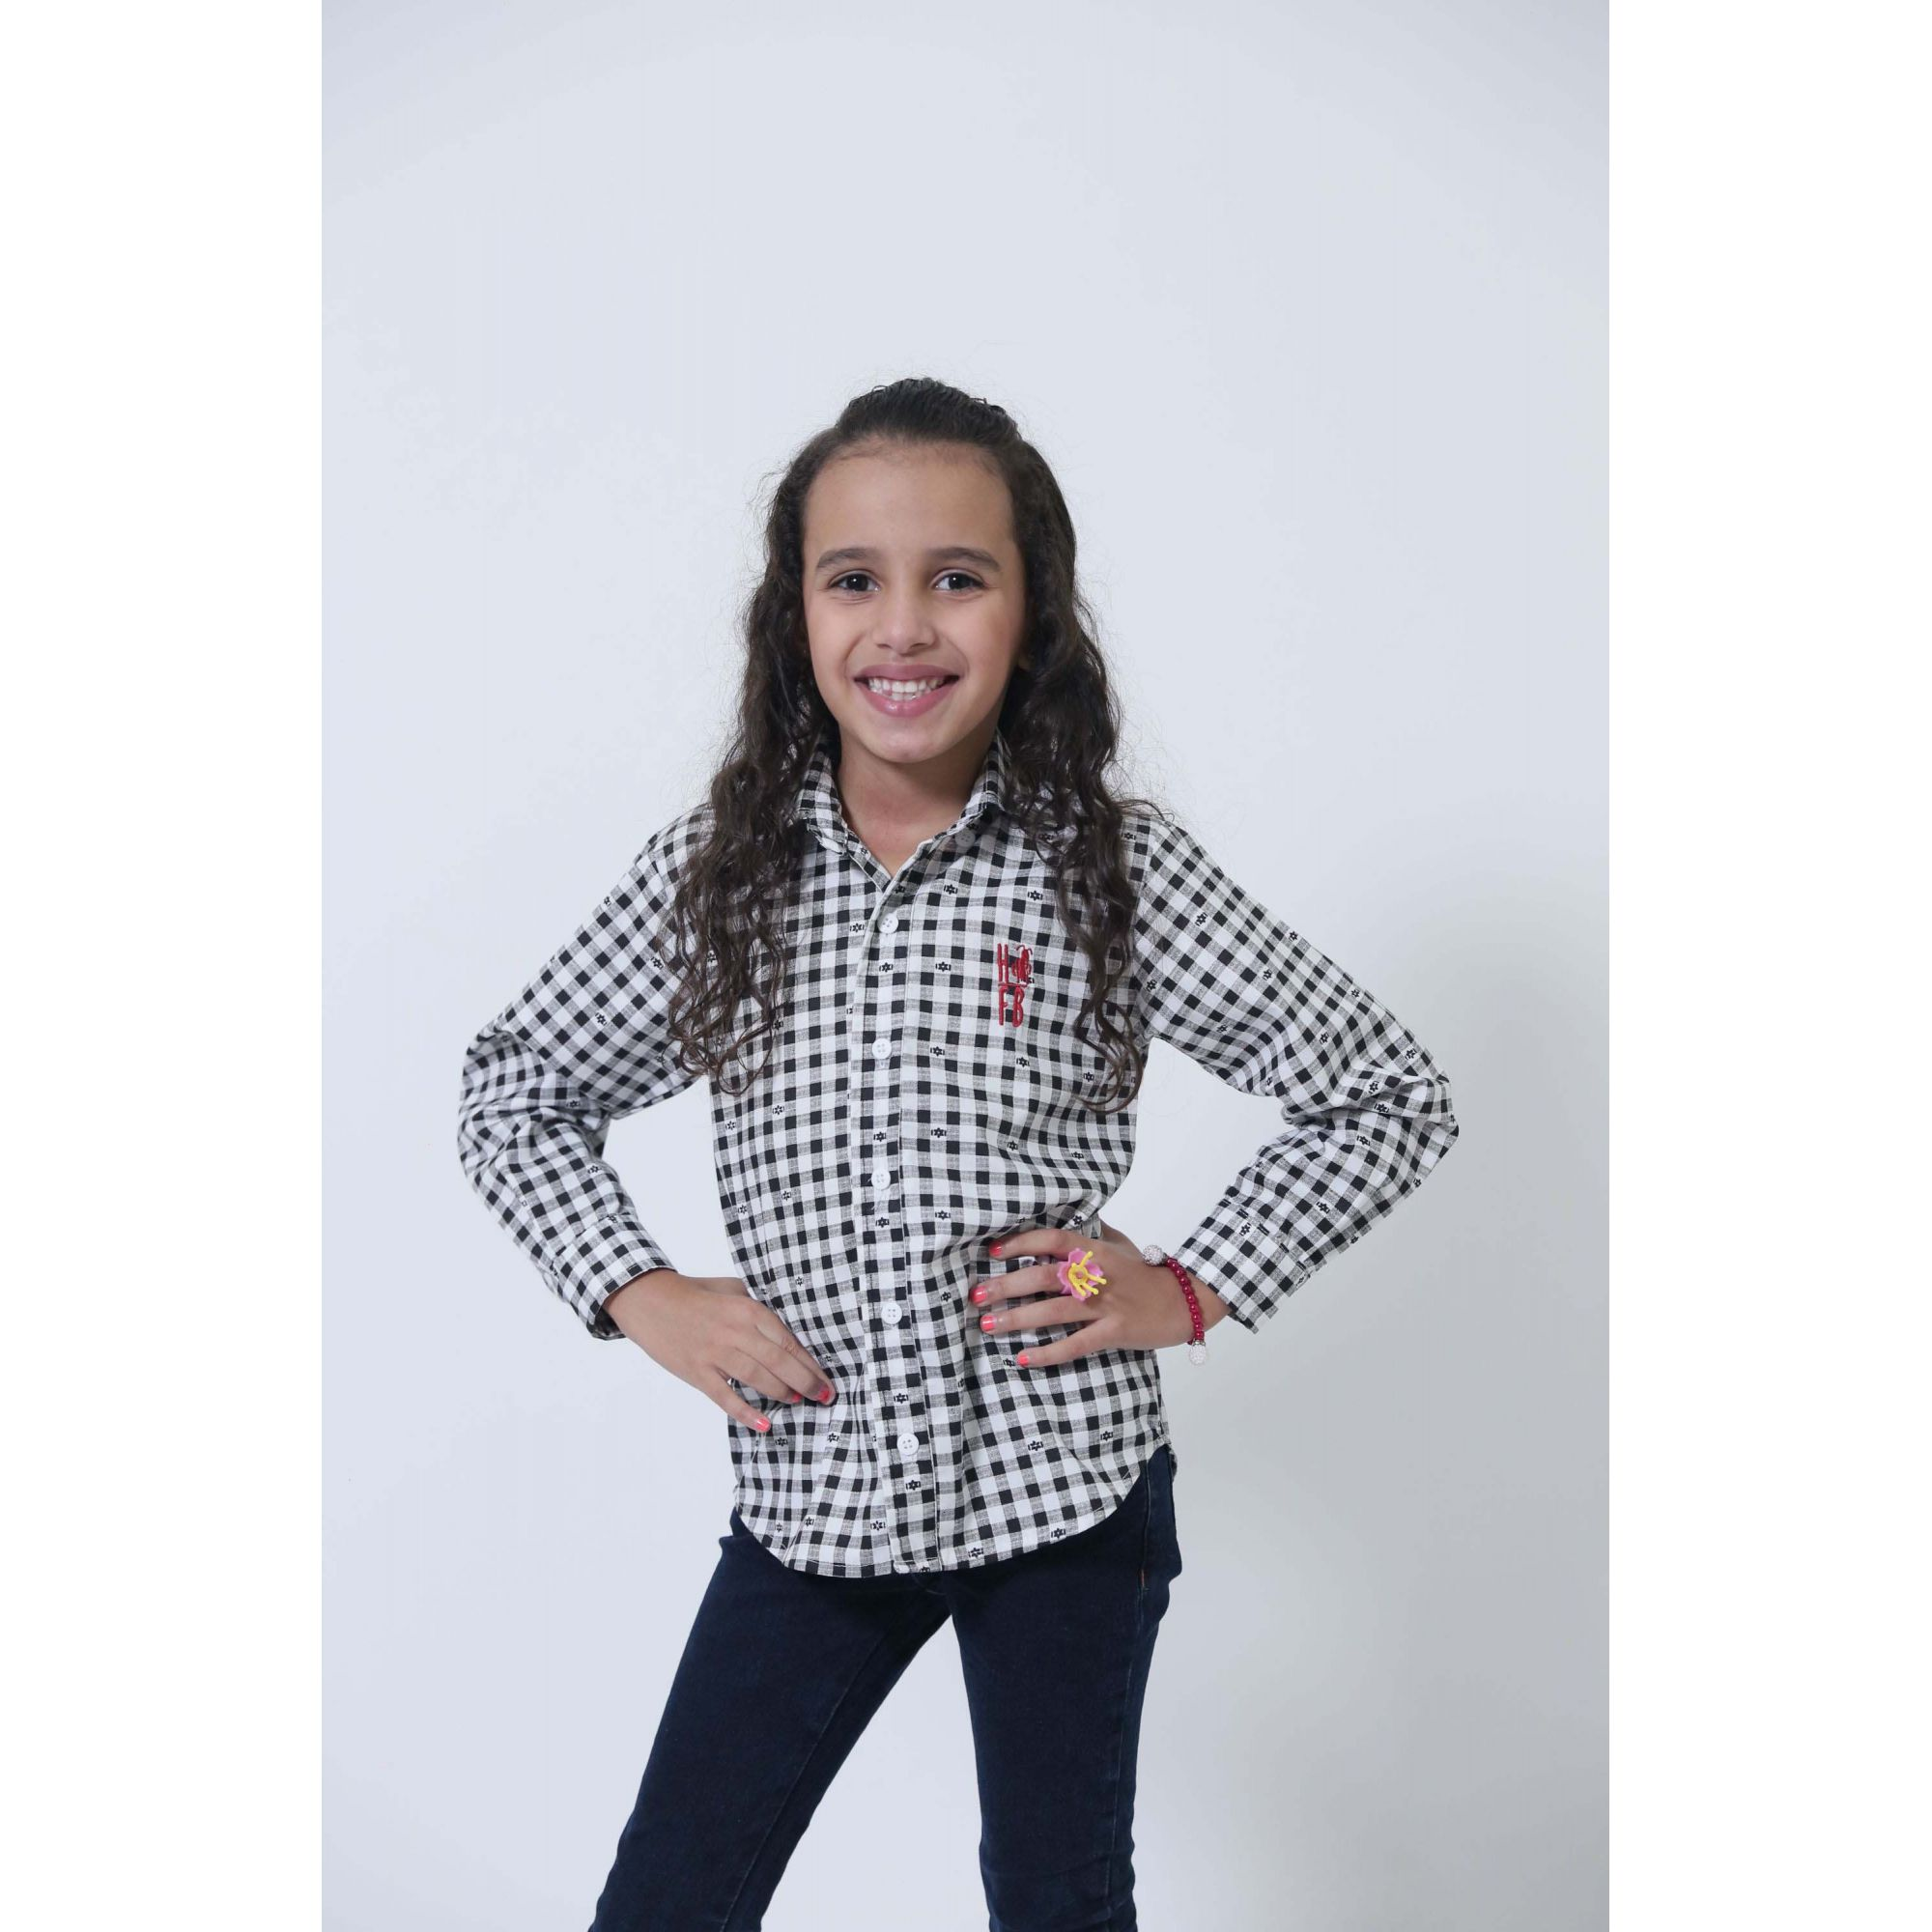 MÃE E FILHA > Kit 02 Camisas Social Xadrez Dama [Coleção Tal Mãe Tal Filha]  - Heitor Fashion Brazil